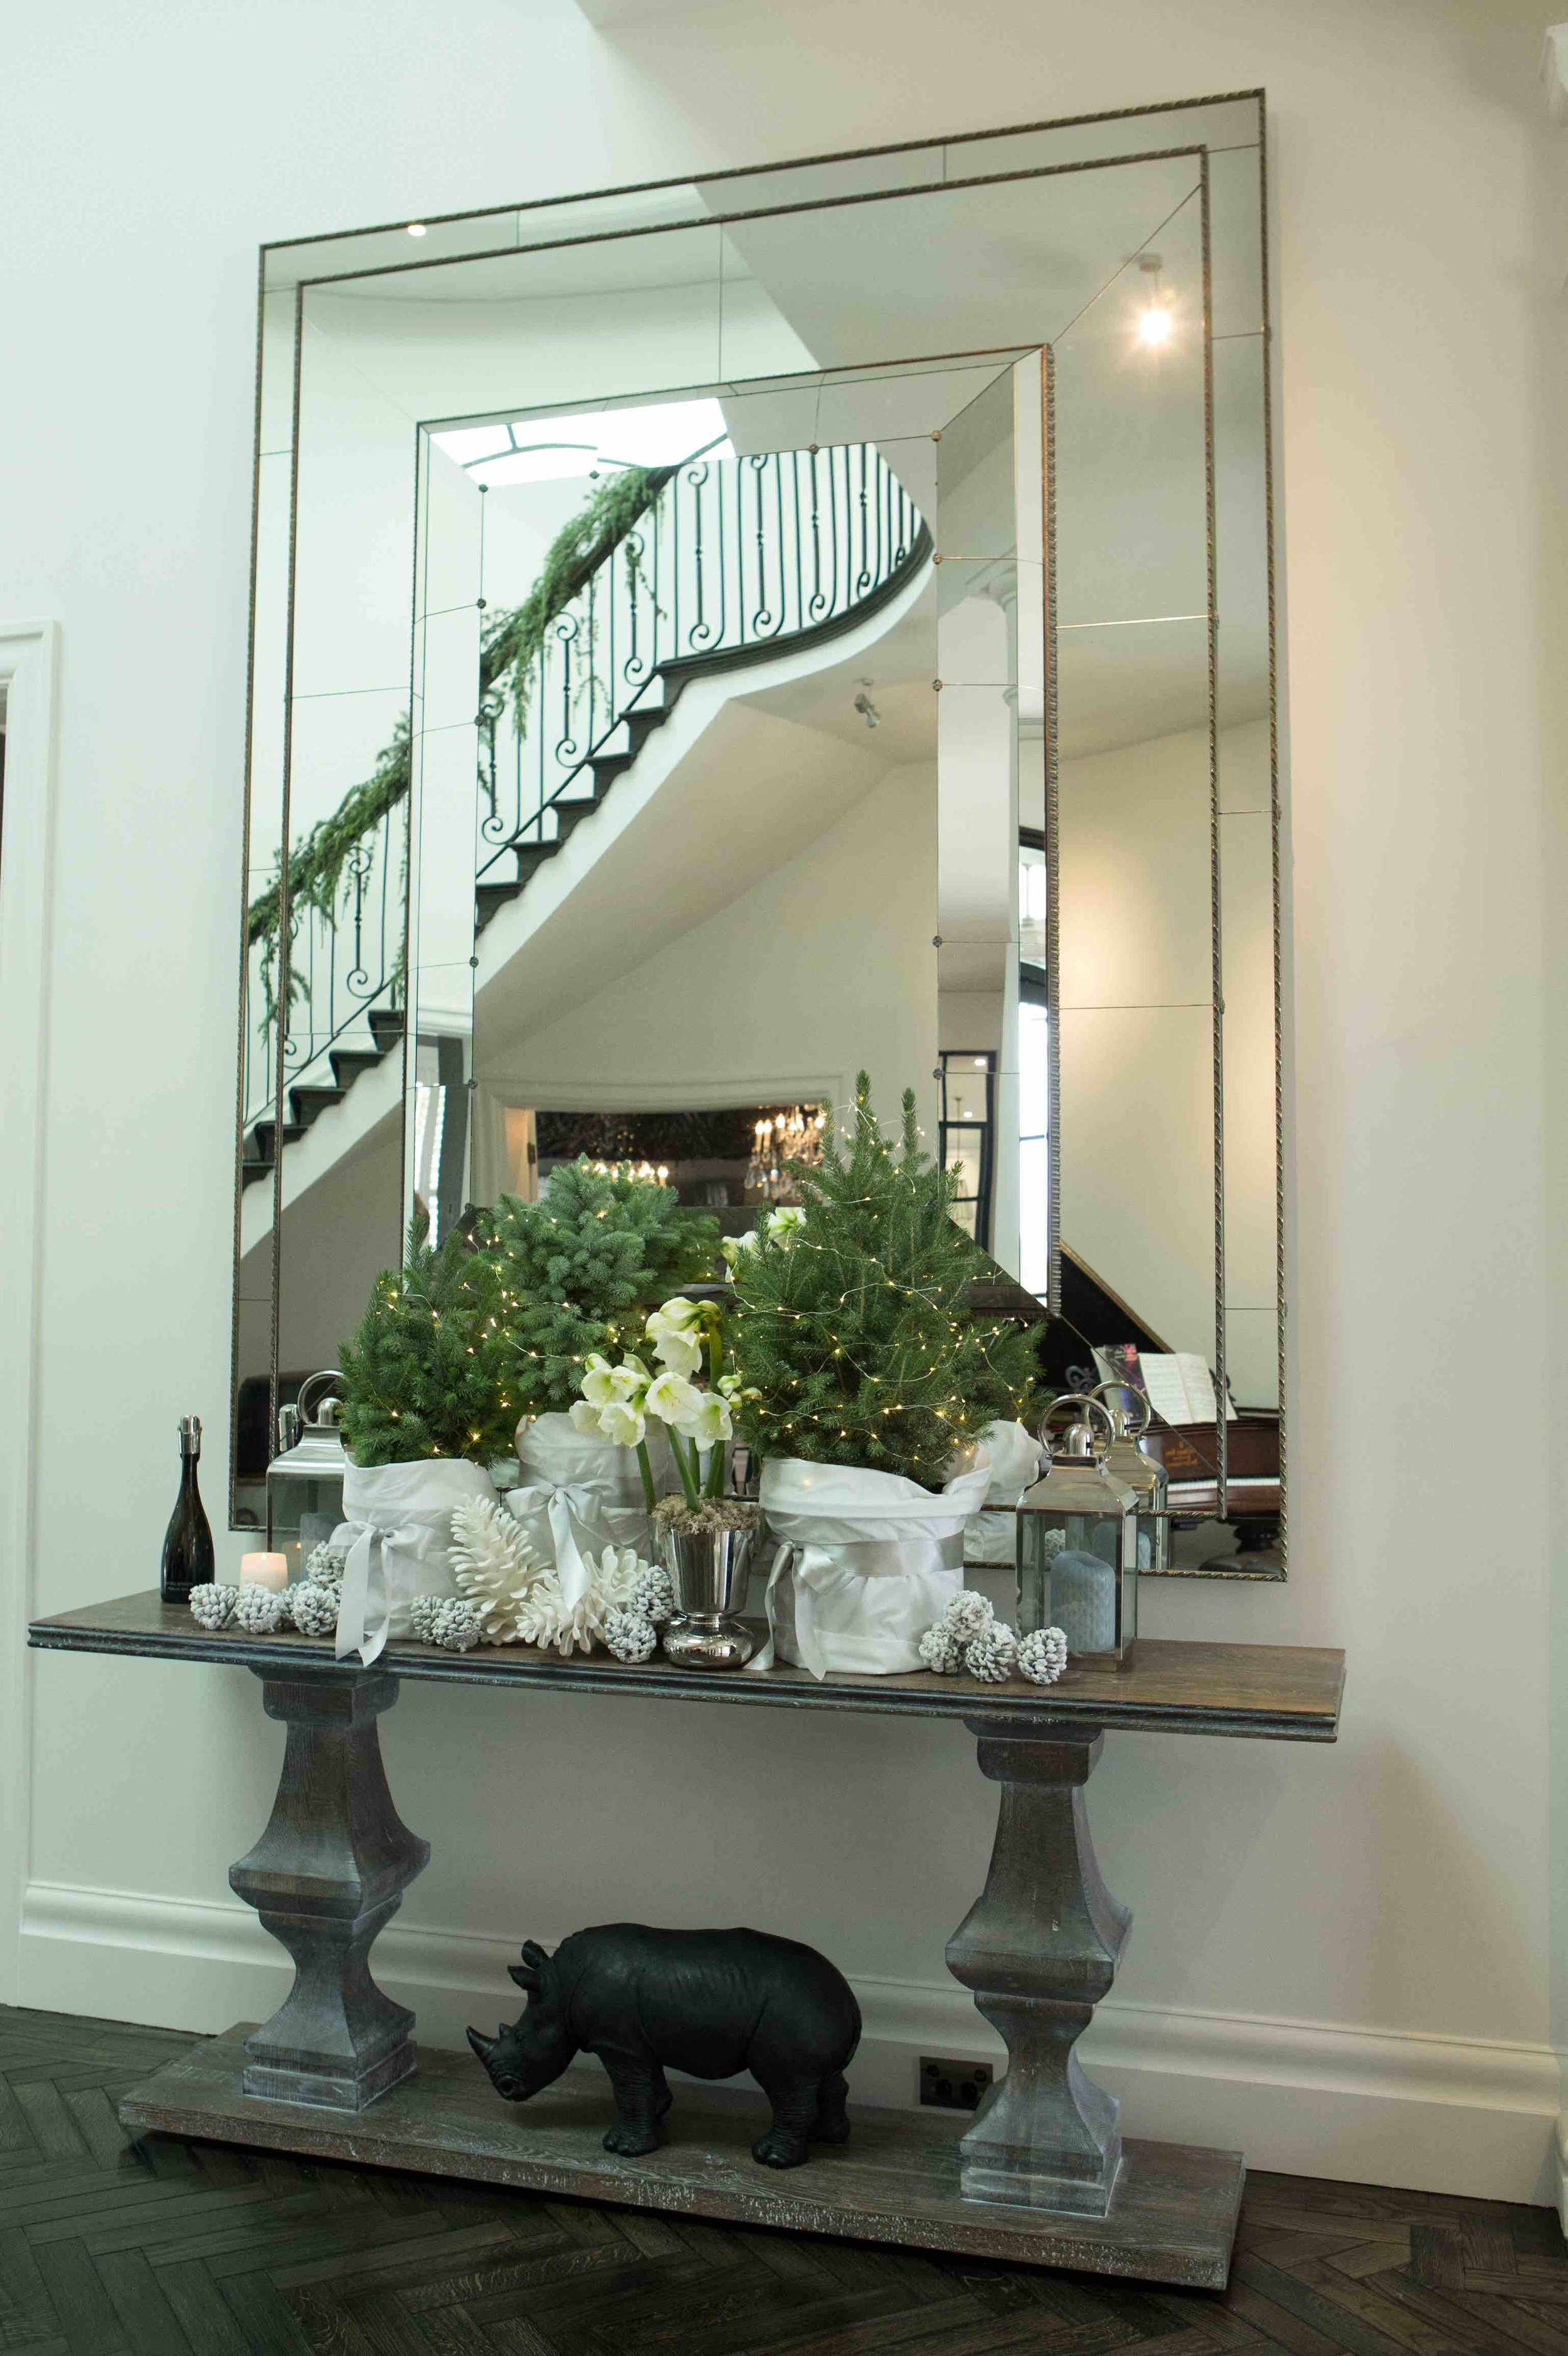 georg-jensen-by-heemskerk-mirror-decor.jpeg